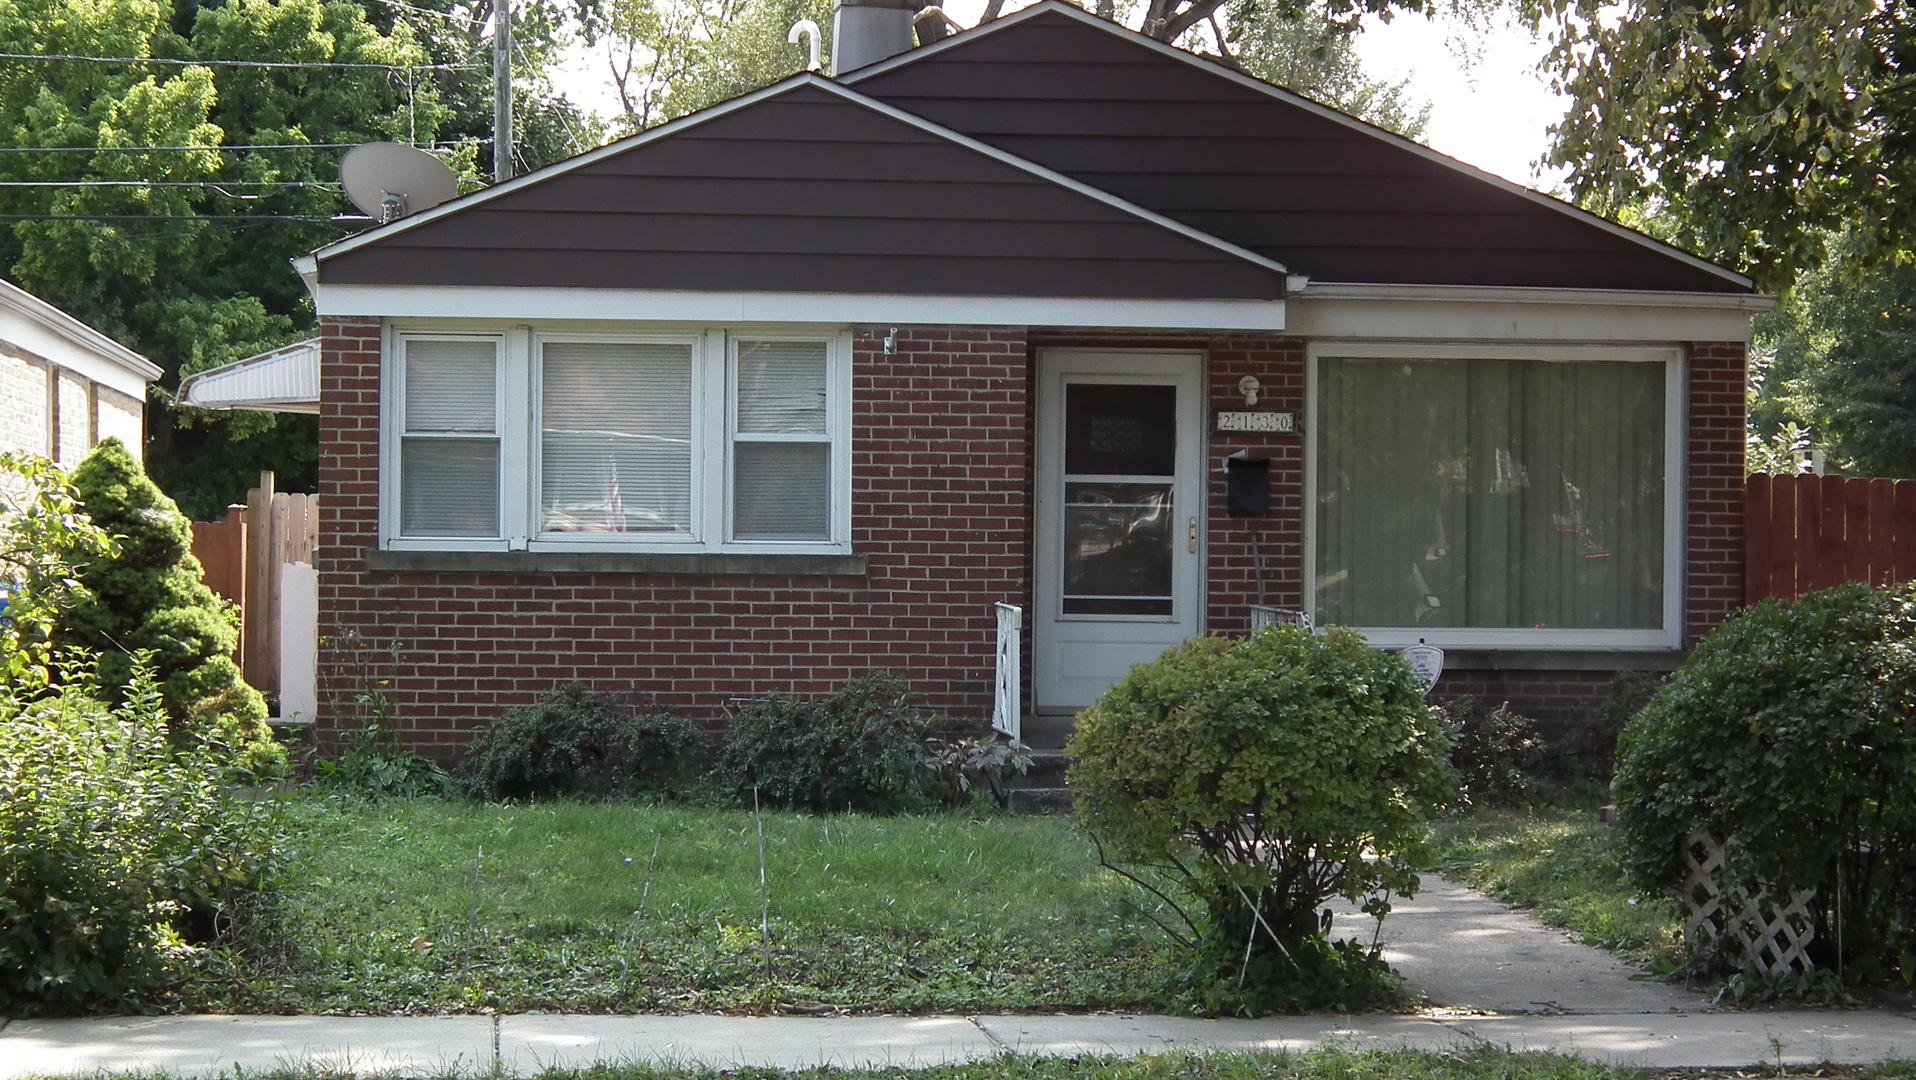 2130 Seward Street, Evanston IL 60202